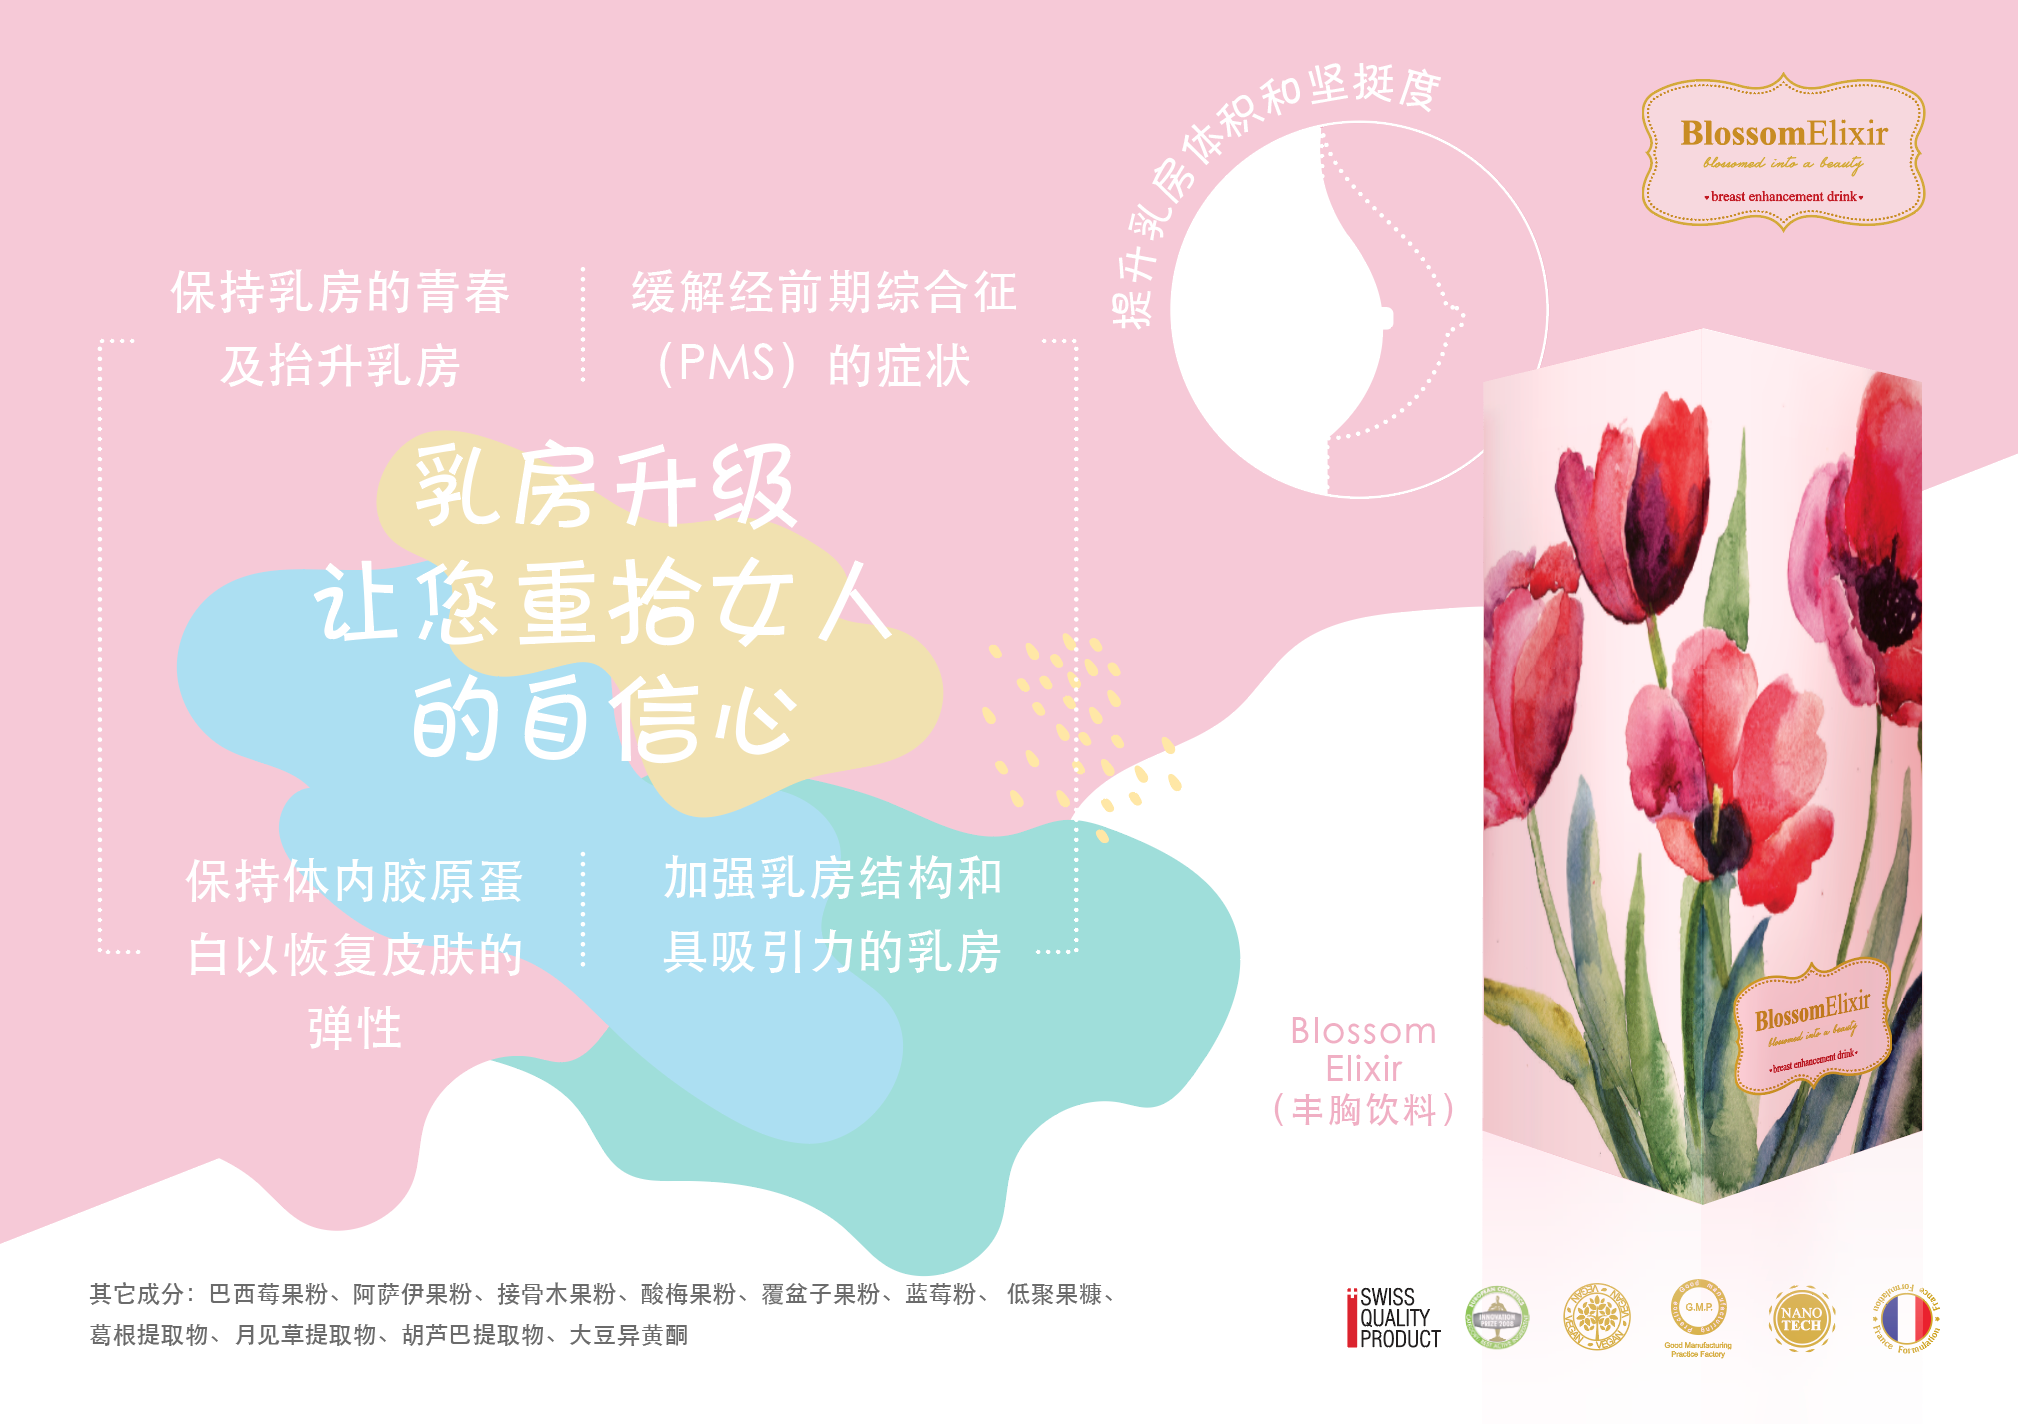 Blossom Elixir | Blossom Elixir Premium Berries Drink